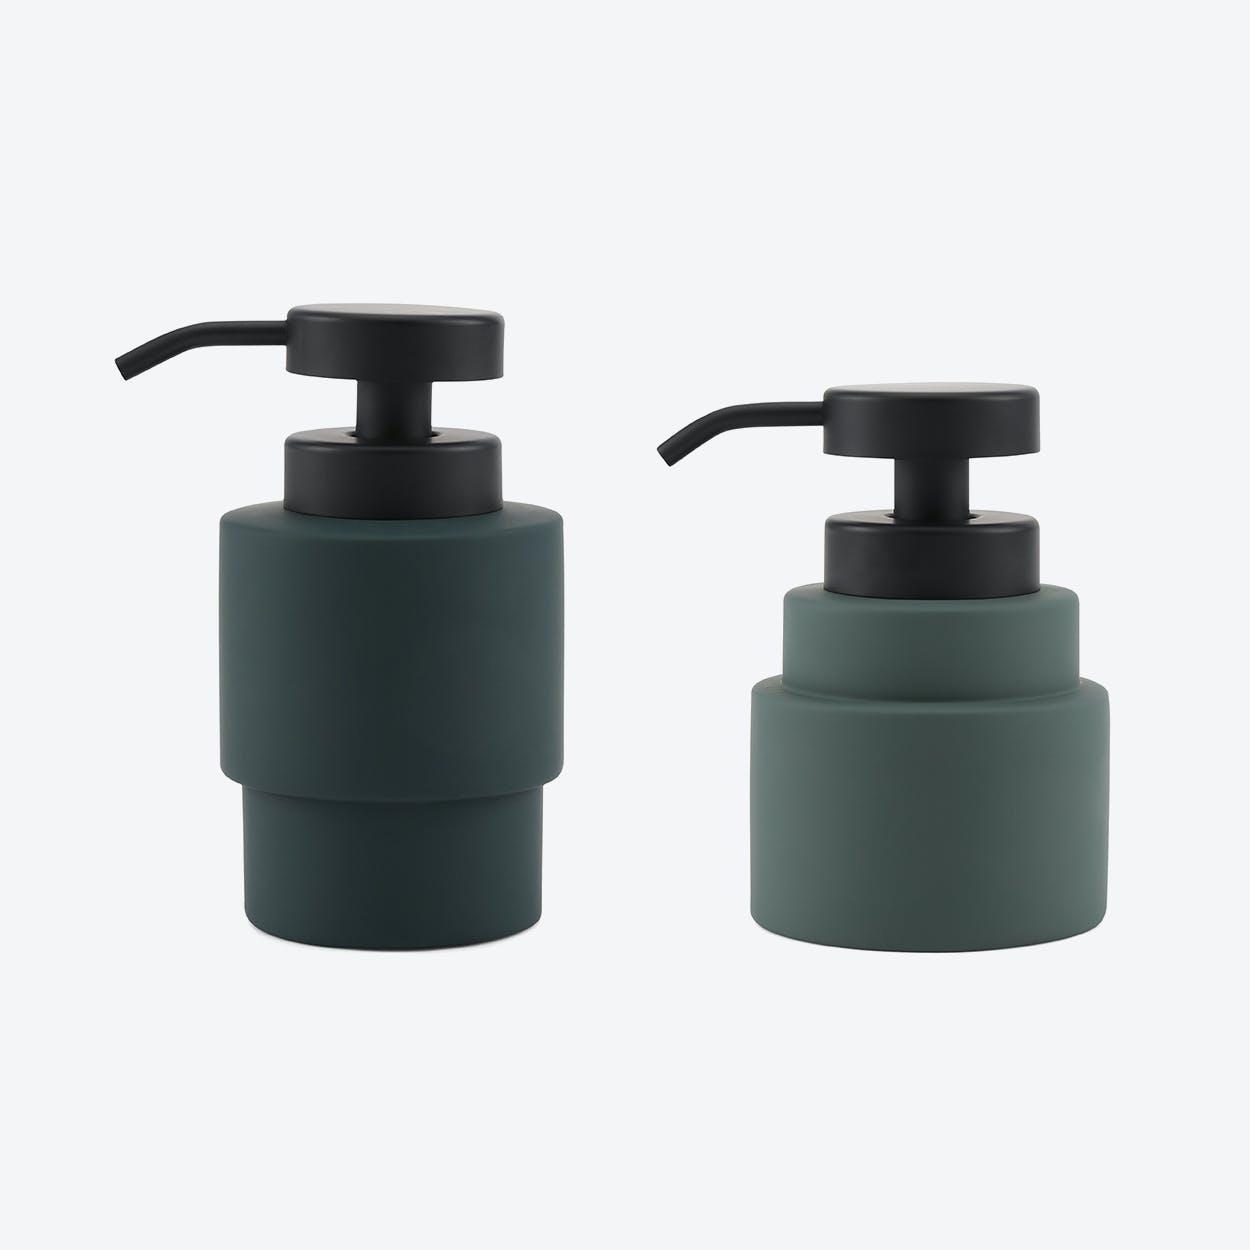 Shades Dispenser Set in Pine Green